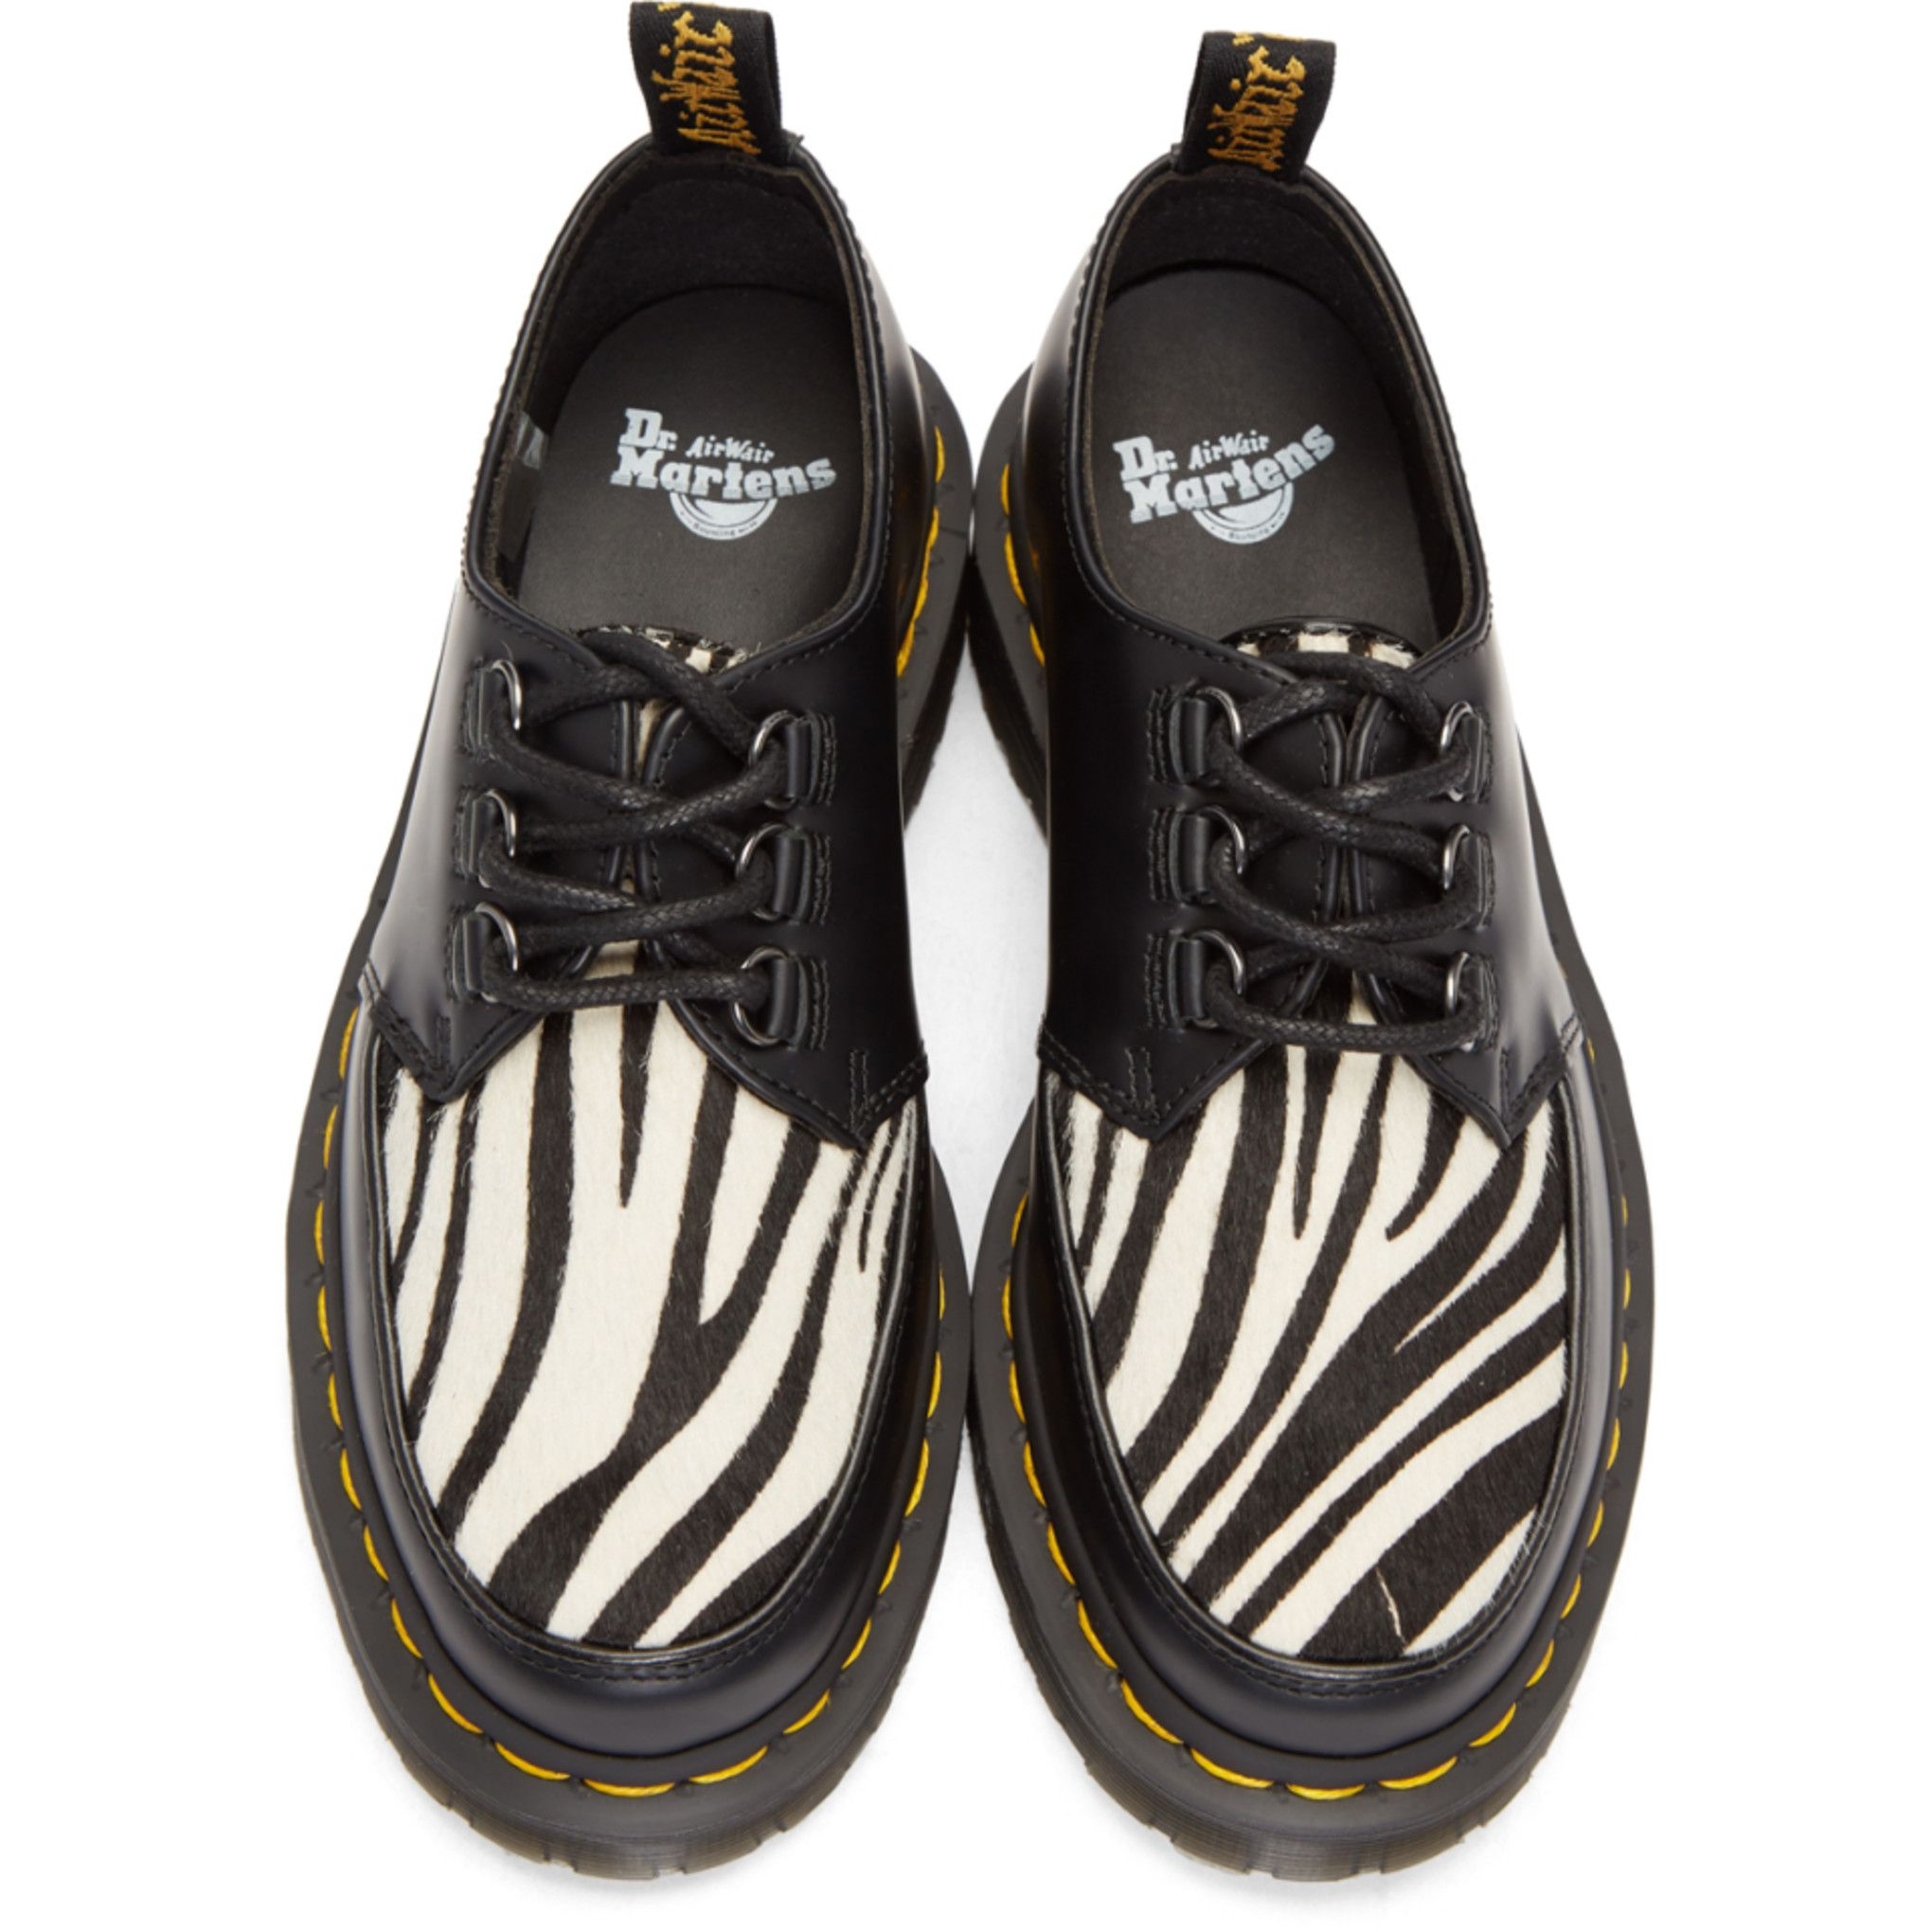 Black Ramsey Zebra Derbys Dr. Martens anR3aRm4g